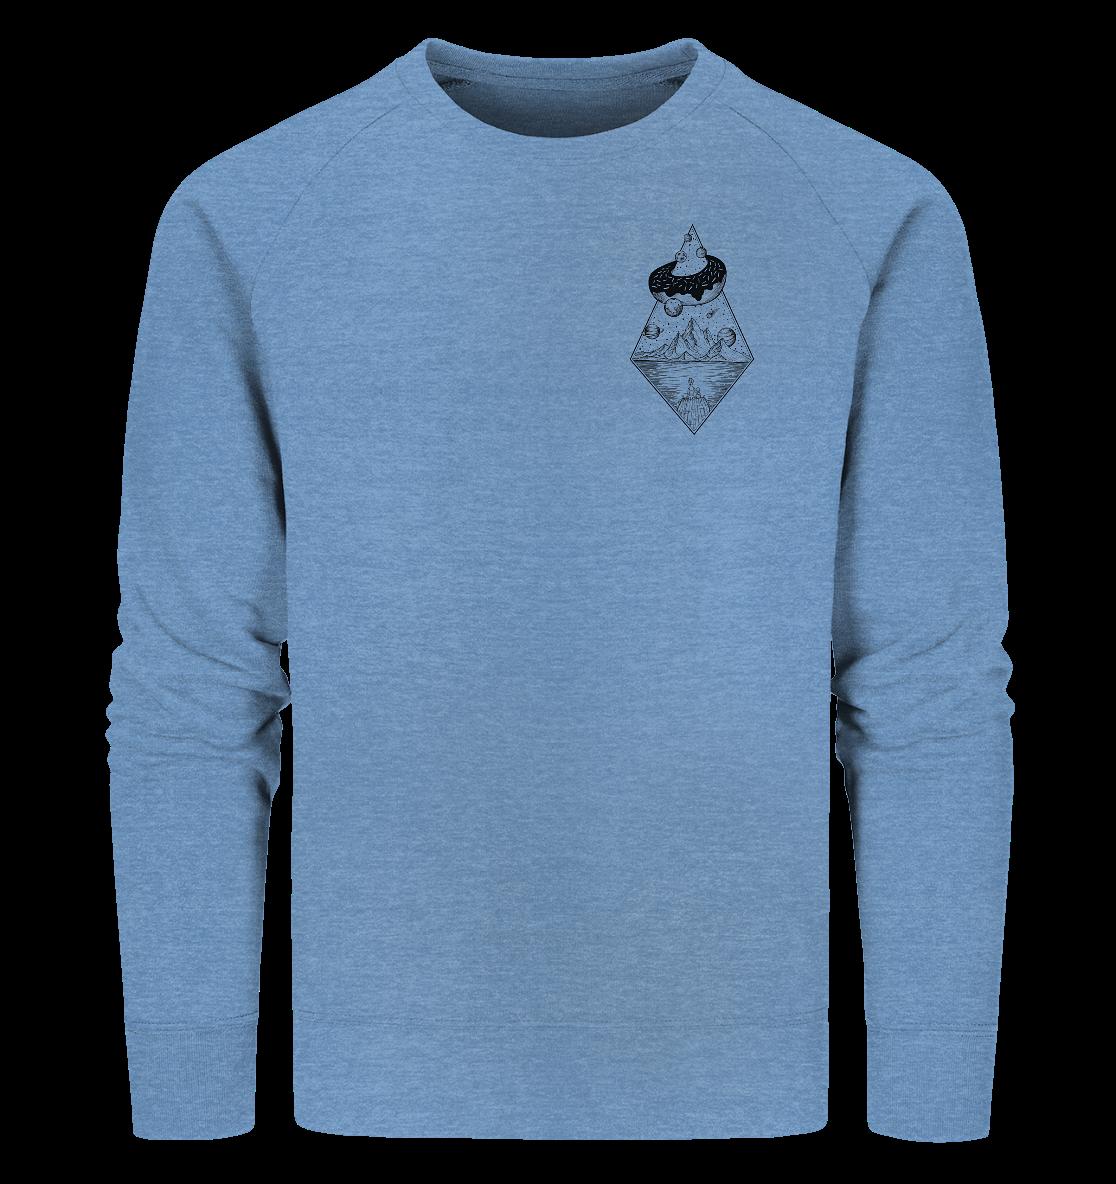 front-organic-sweatshirt-6090c4-1116x.png